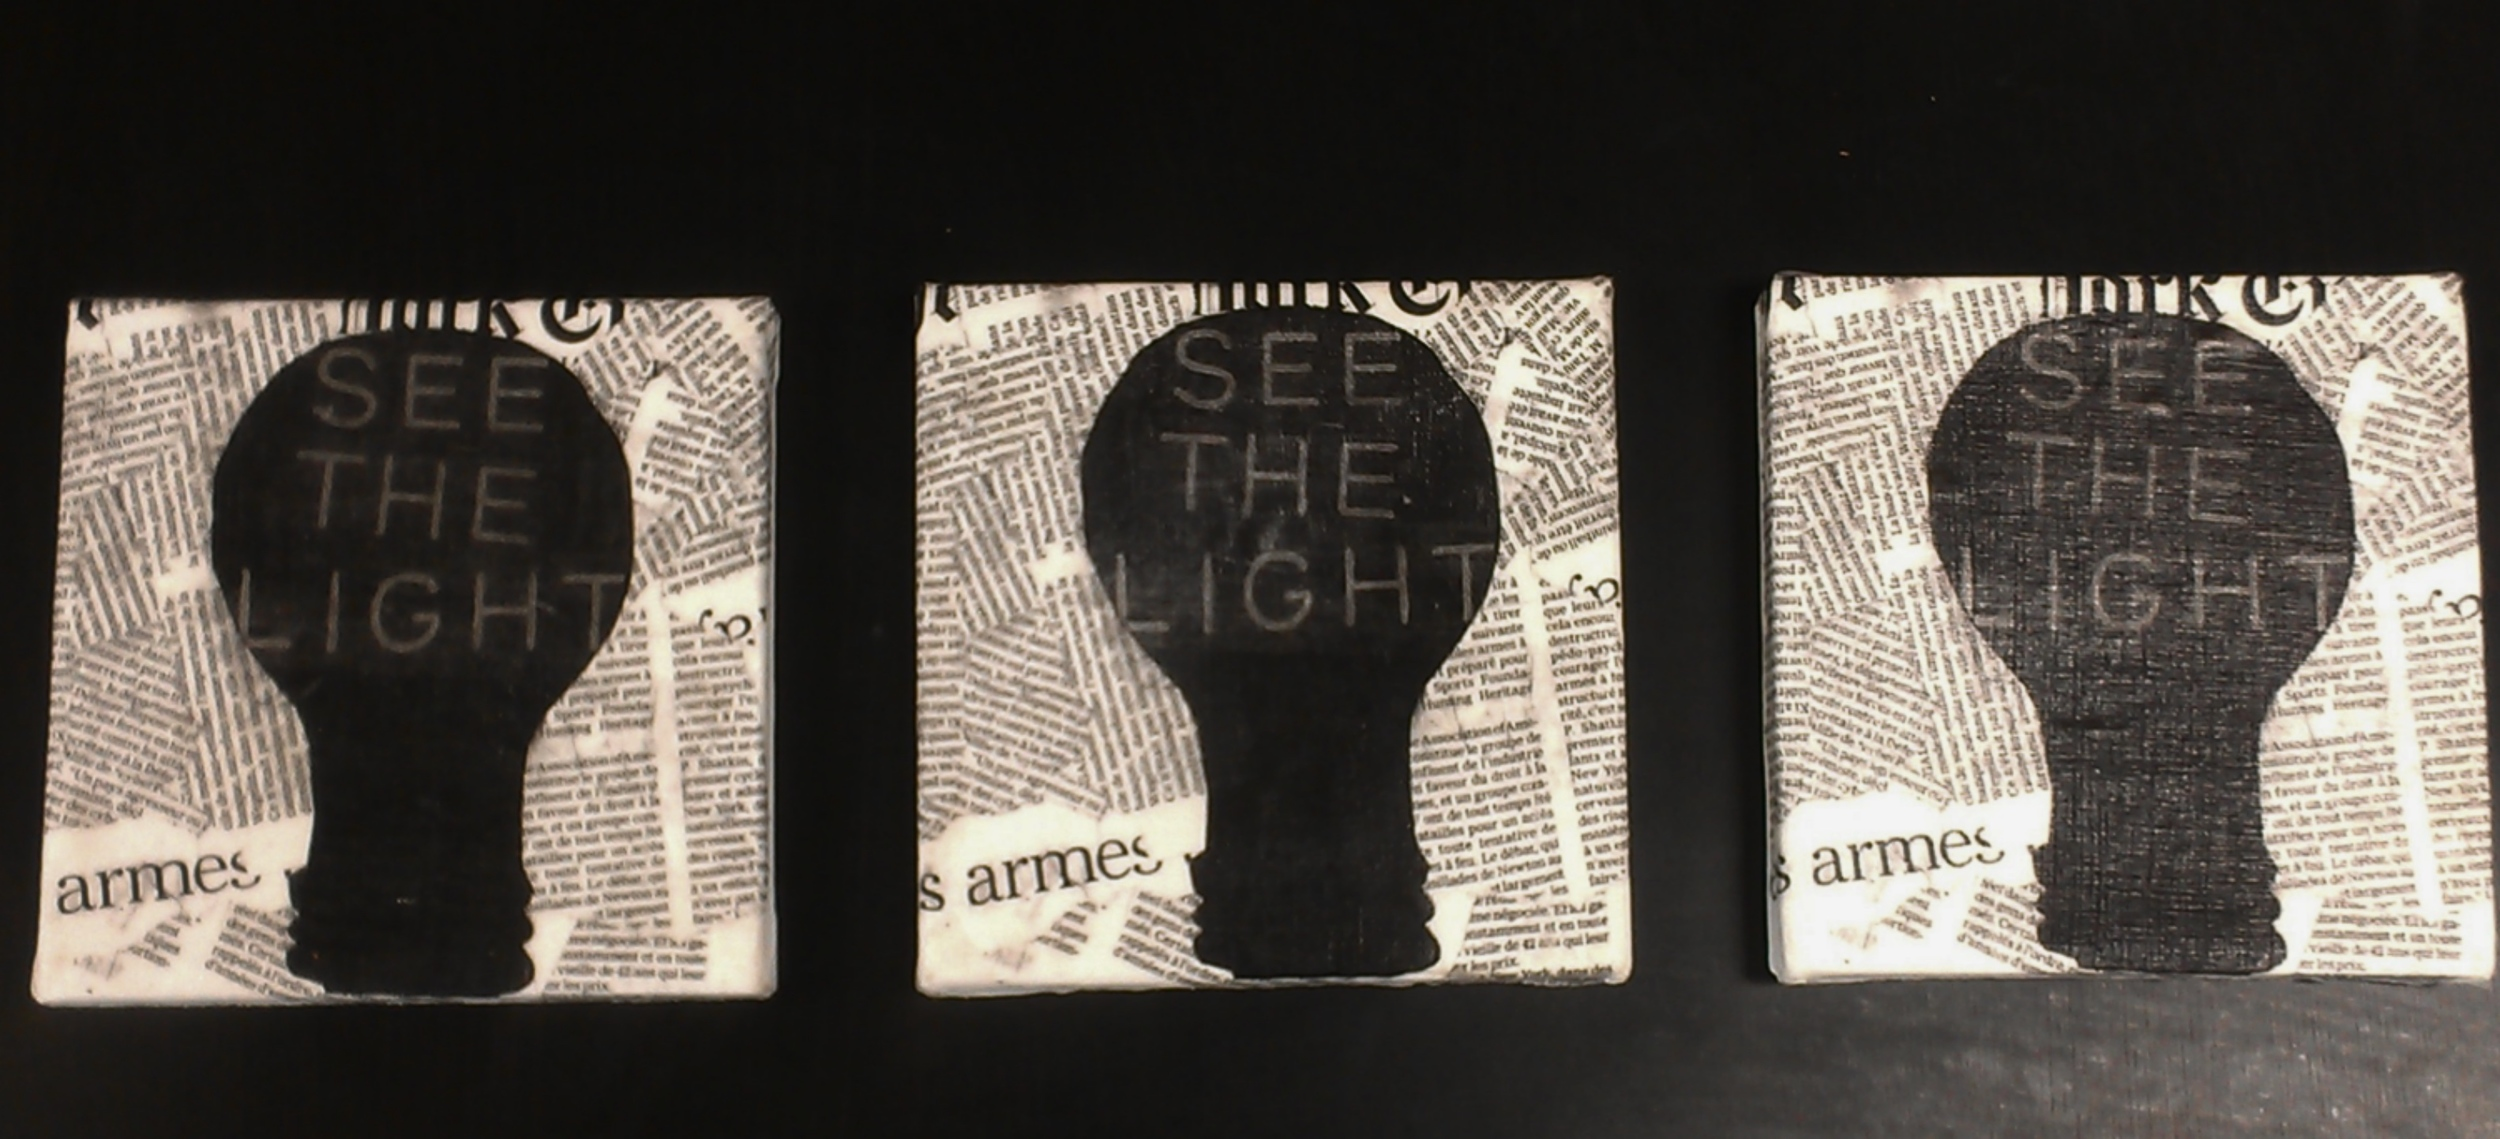 see the light_Fotor.jpg